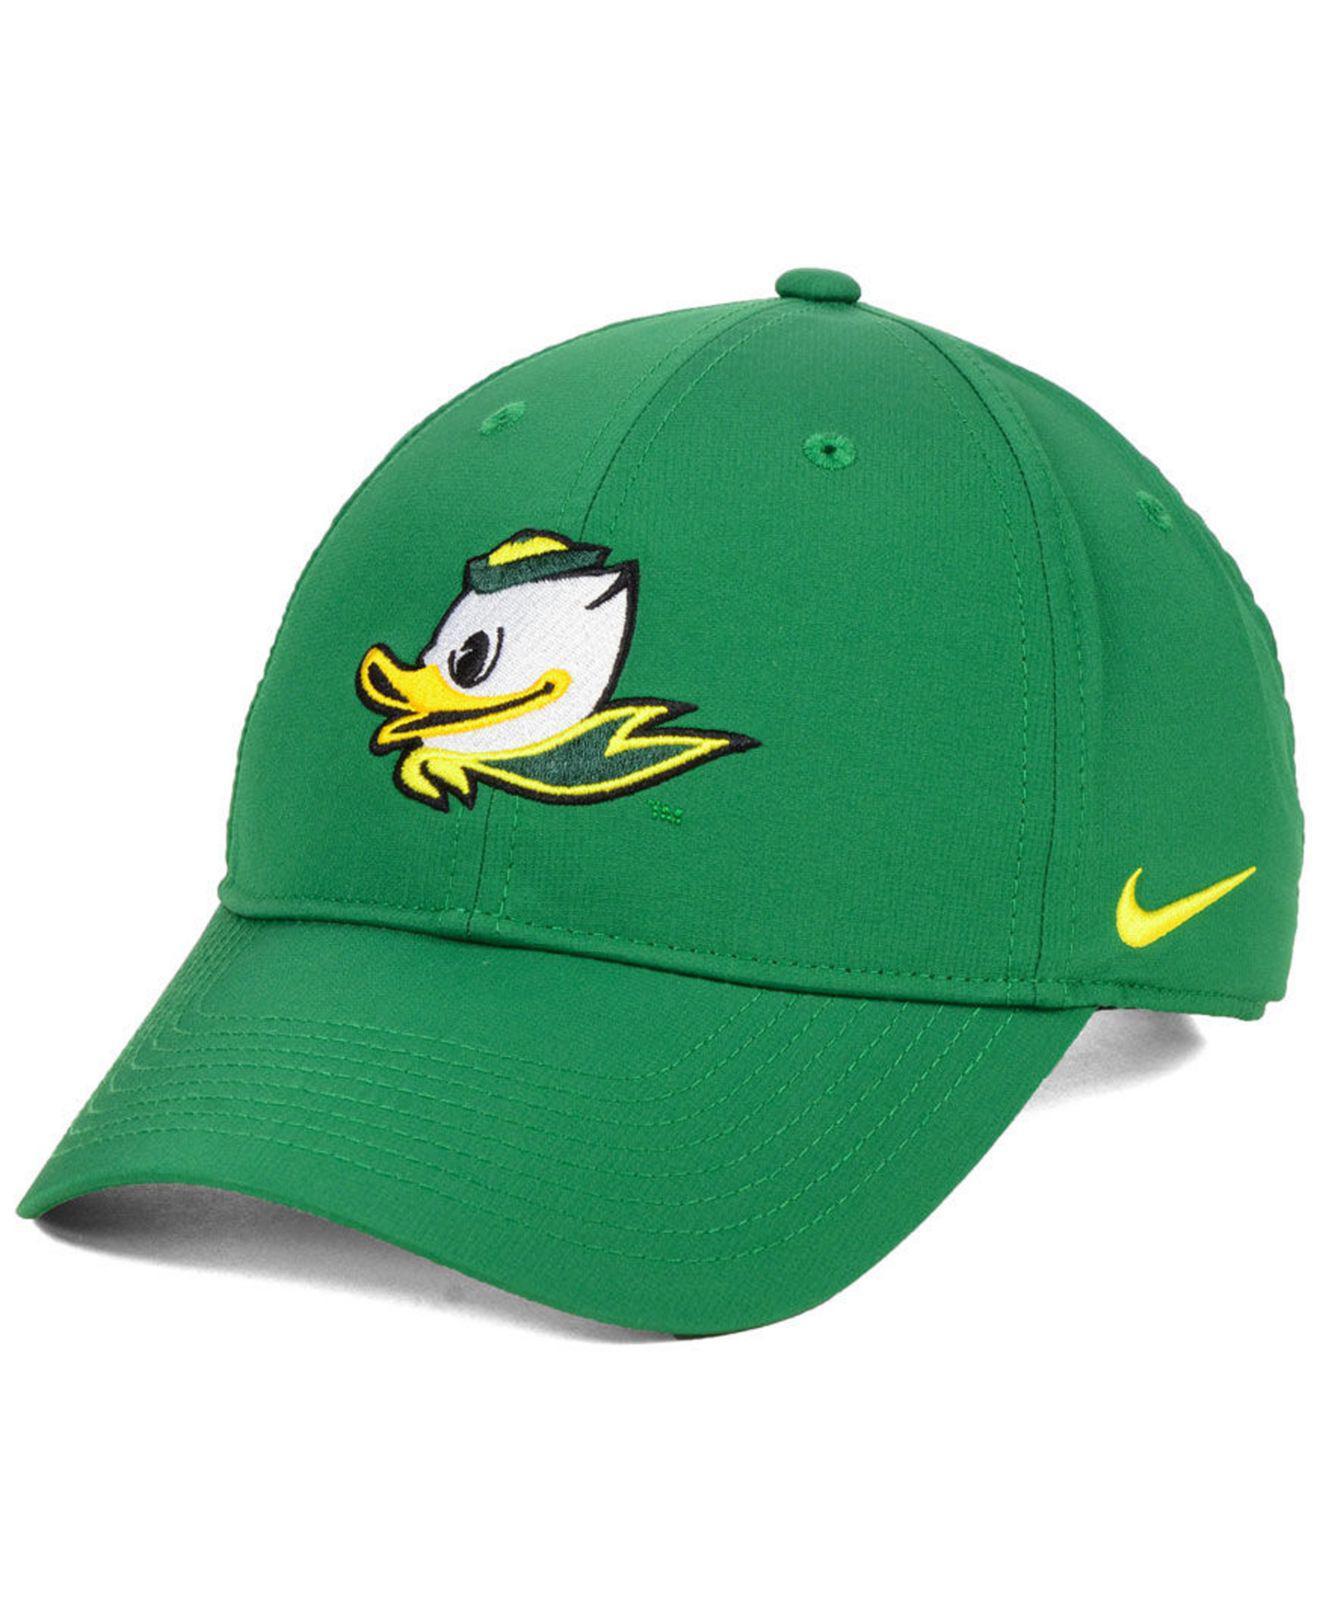 5cb187537f574 Lyst - Nike Oregon Ducks Dri-fit Adjustable Cap in Green for Men